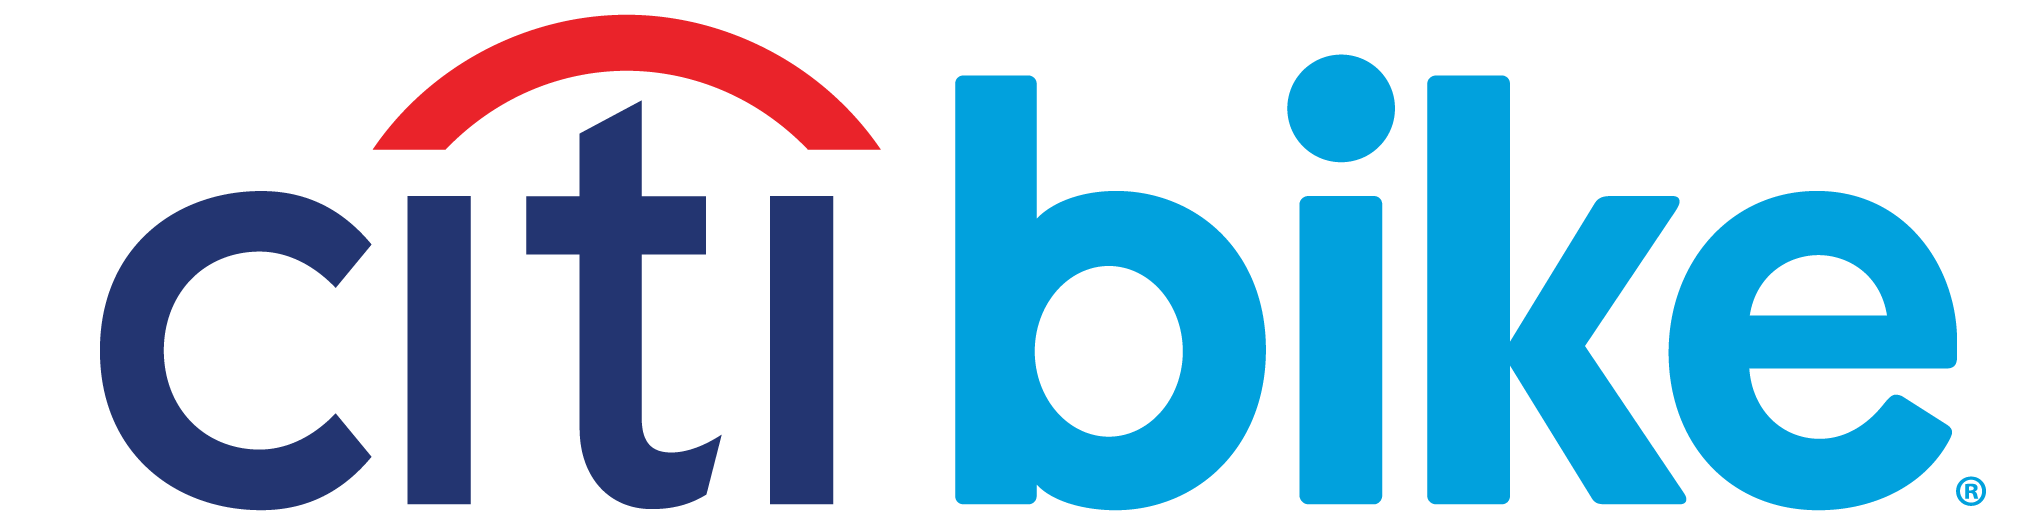 Citibank PNG-PlusPNG.com-2041 - Citibank PNG